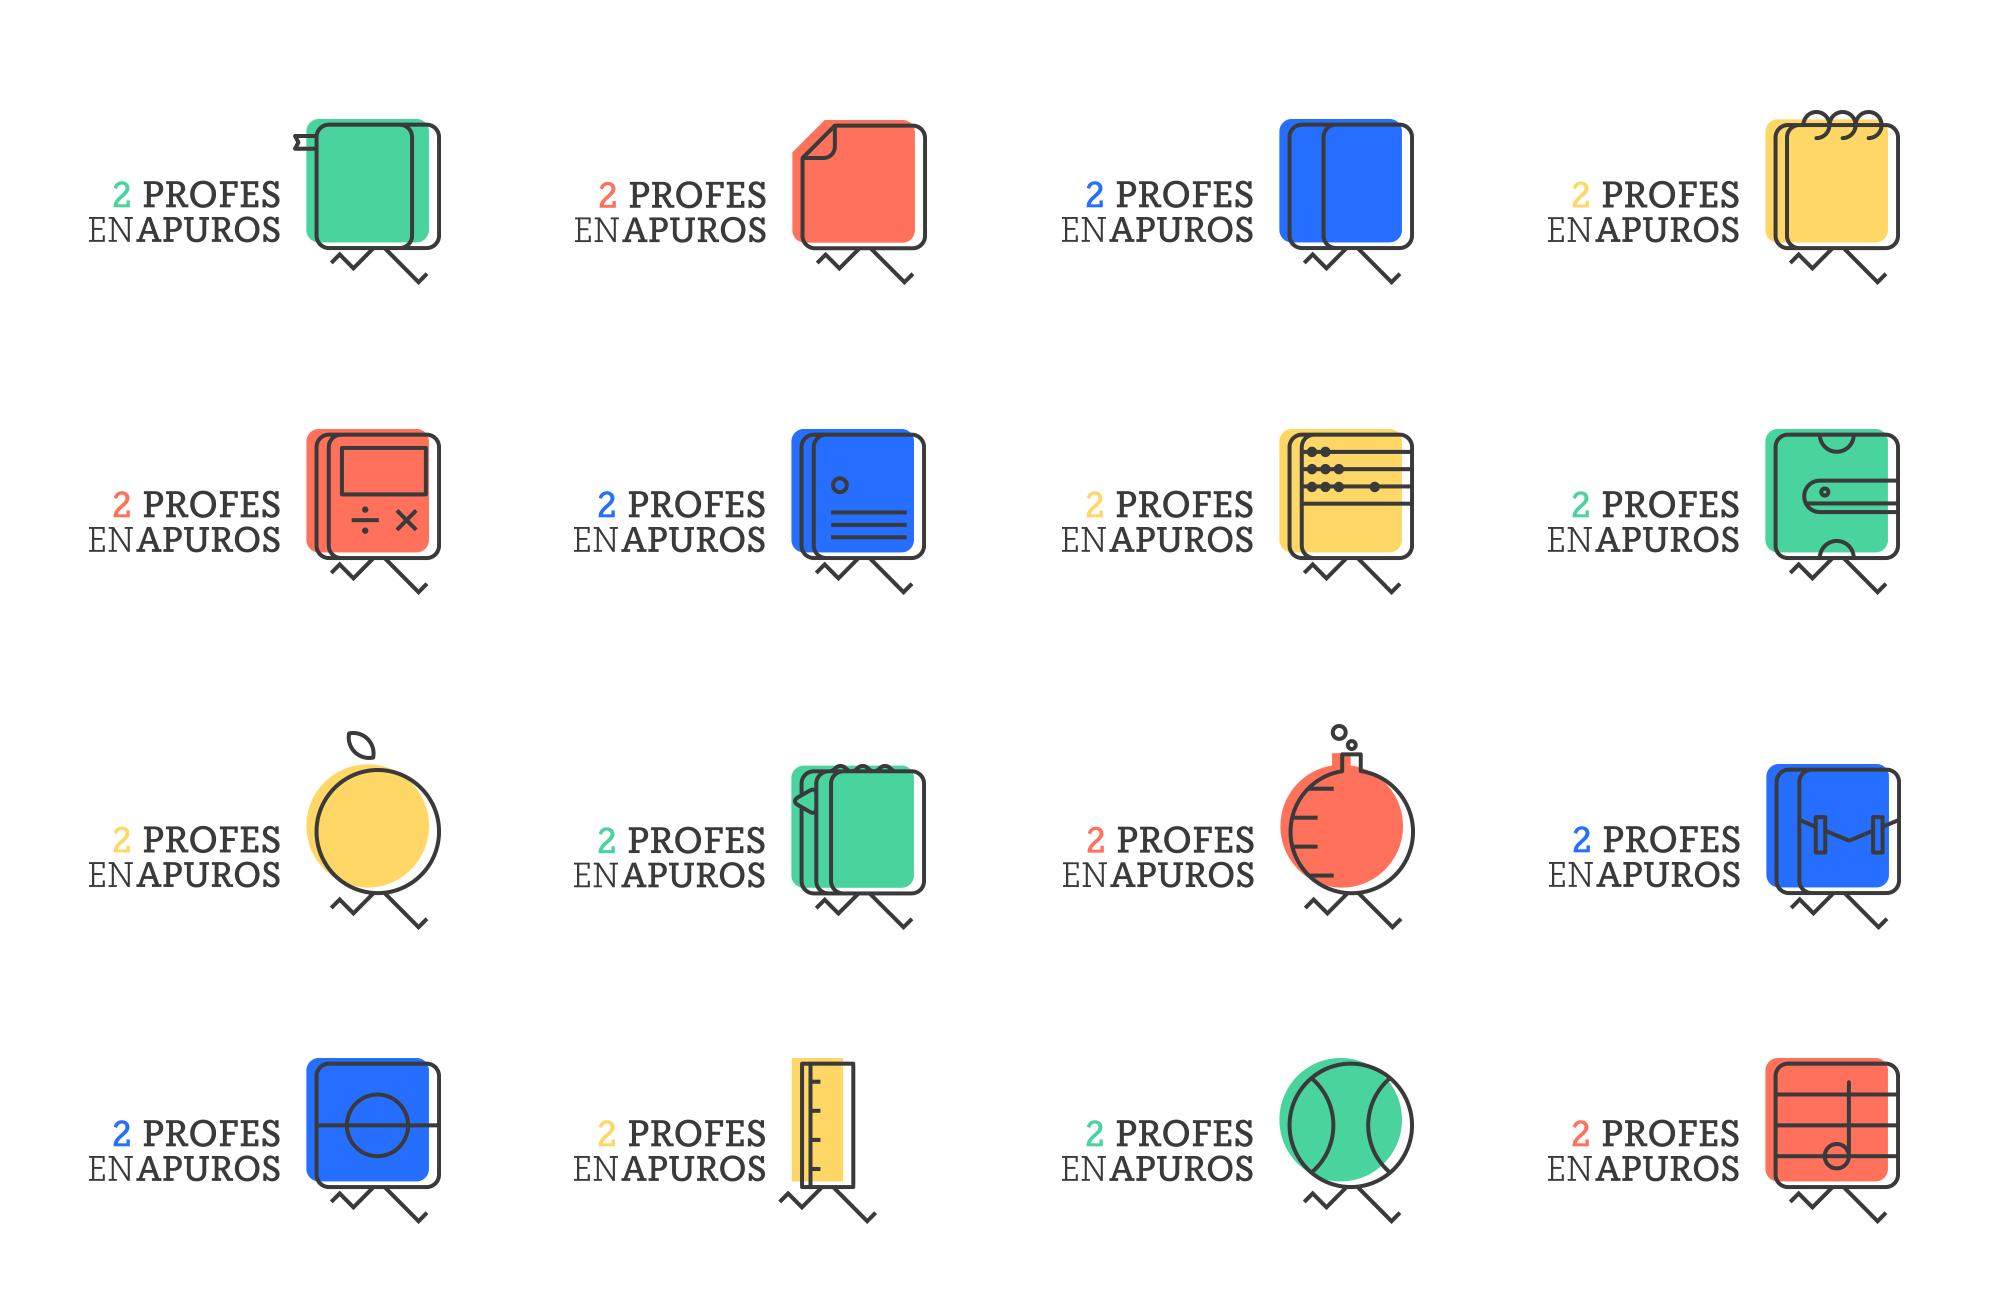 logos_2profes